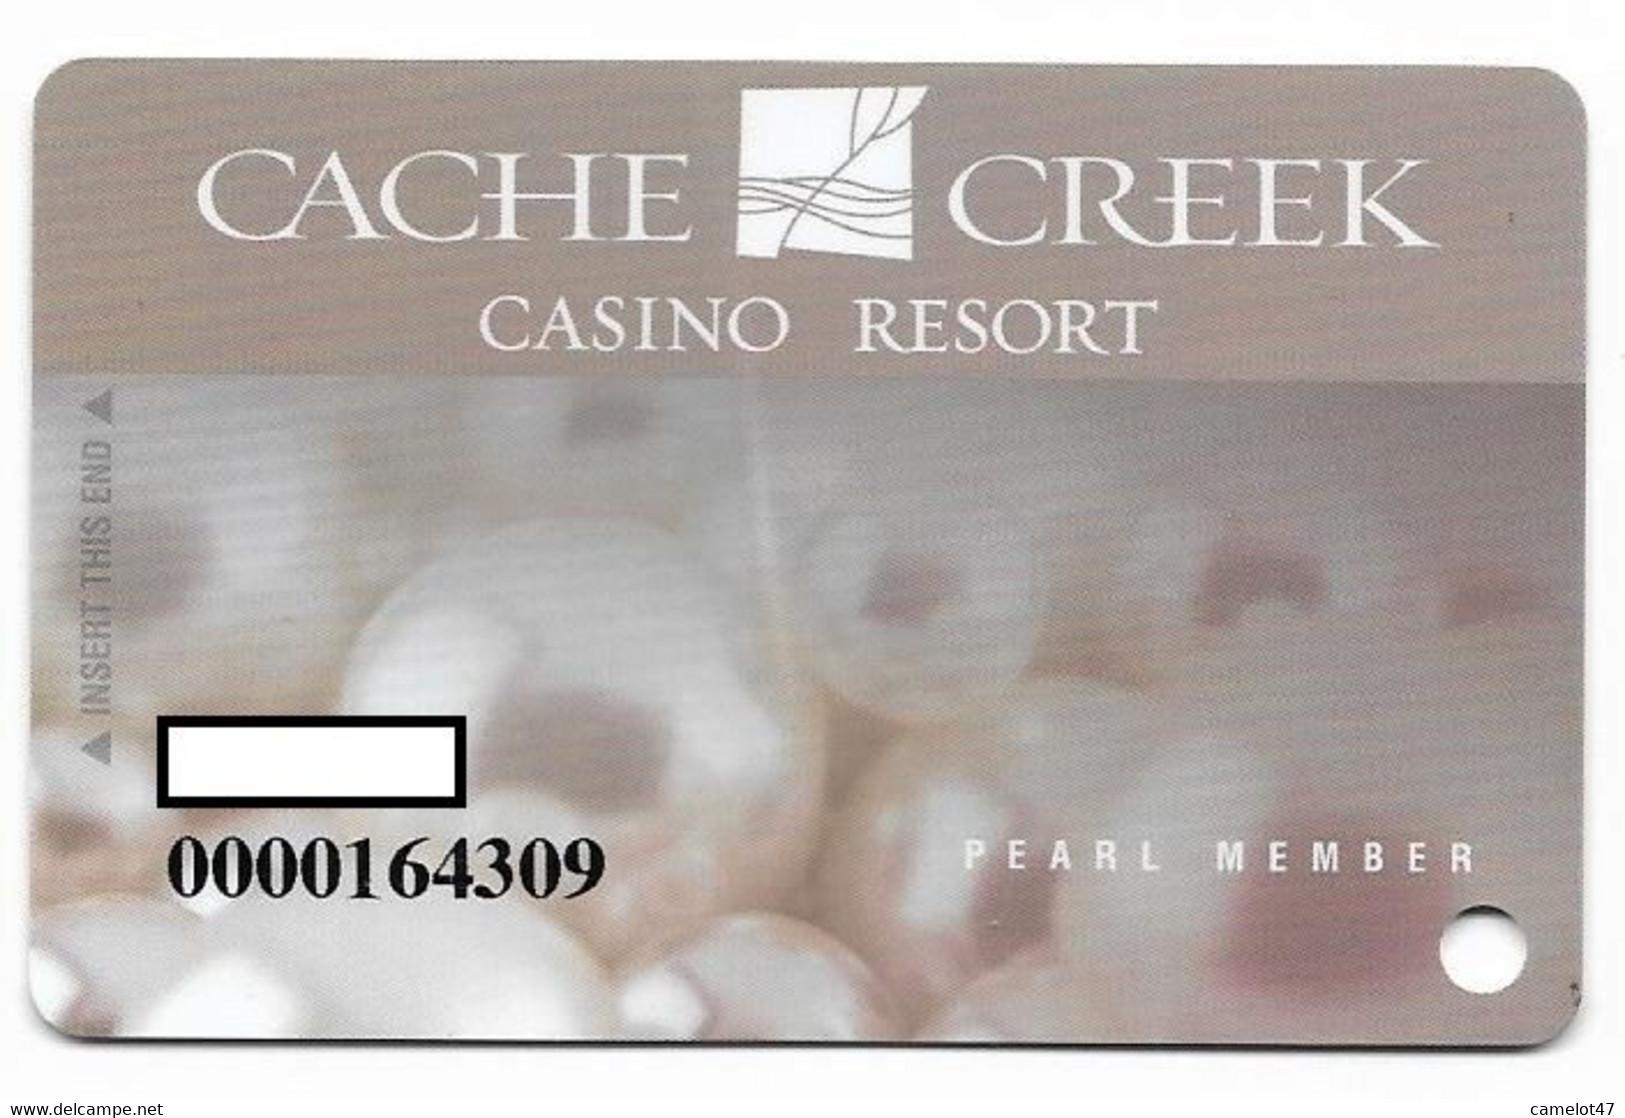 Cache Creek Casino, Brooks, CA, U.S.A., Older Used Slot Or Player's Card, # Cachecreek-3 - Casino Cards